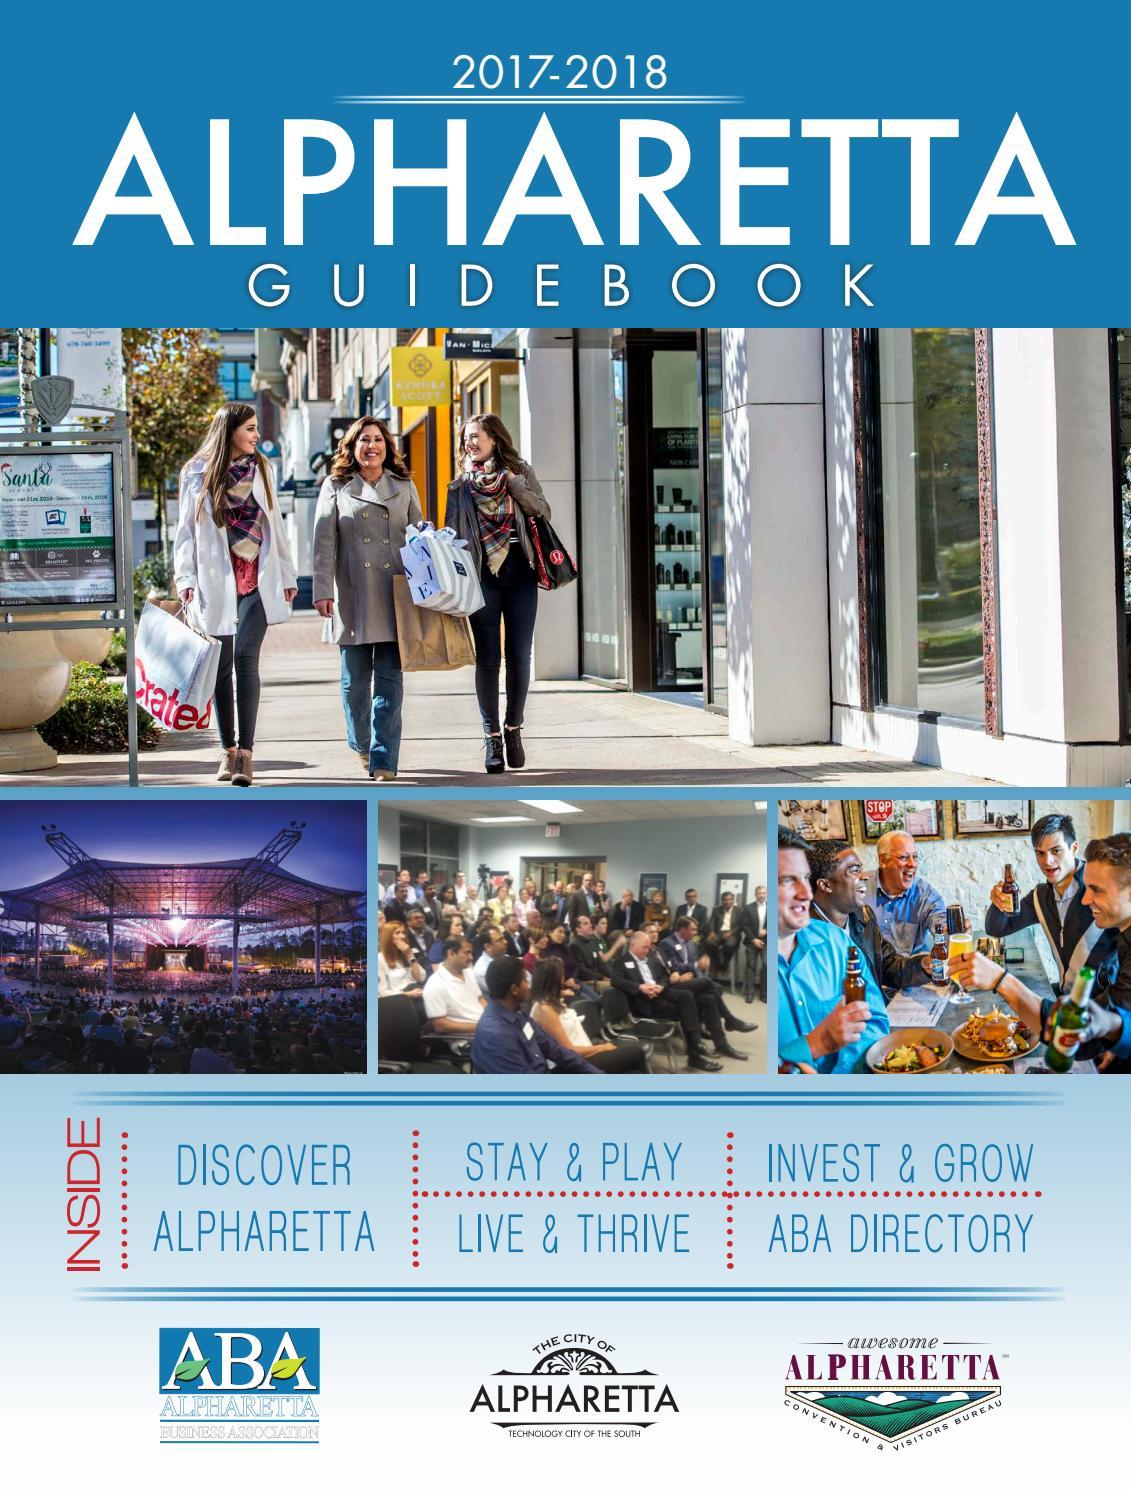 Alpharetta Guidebook 2017 by PubMan, Inc. - issuu